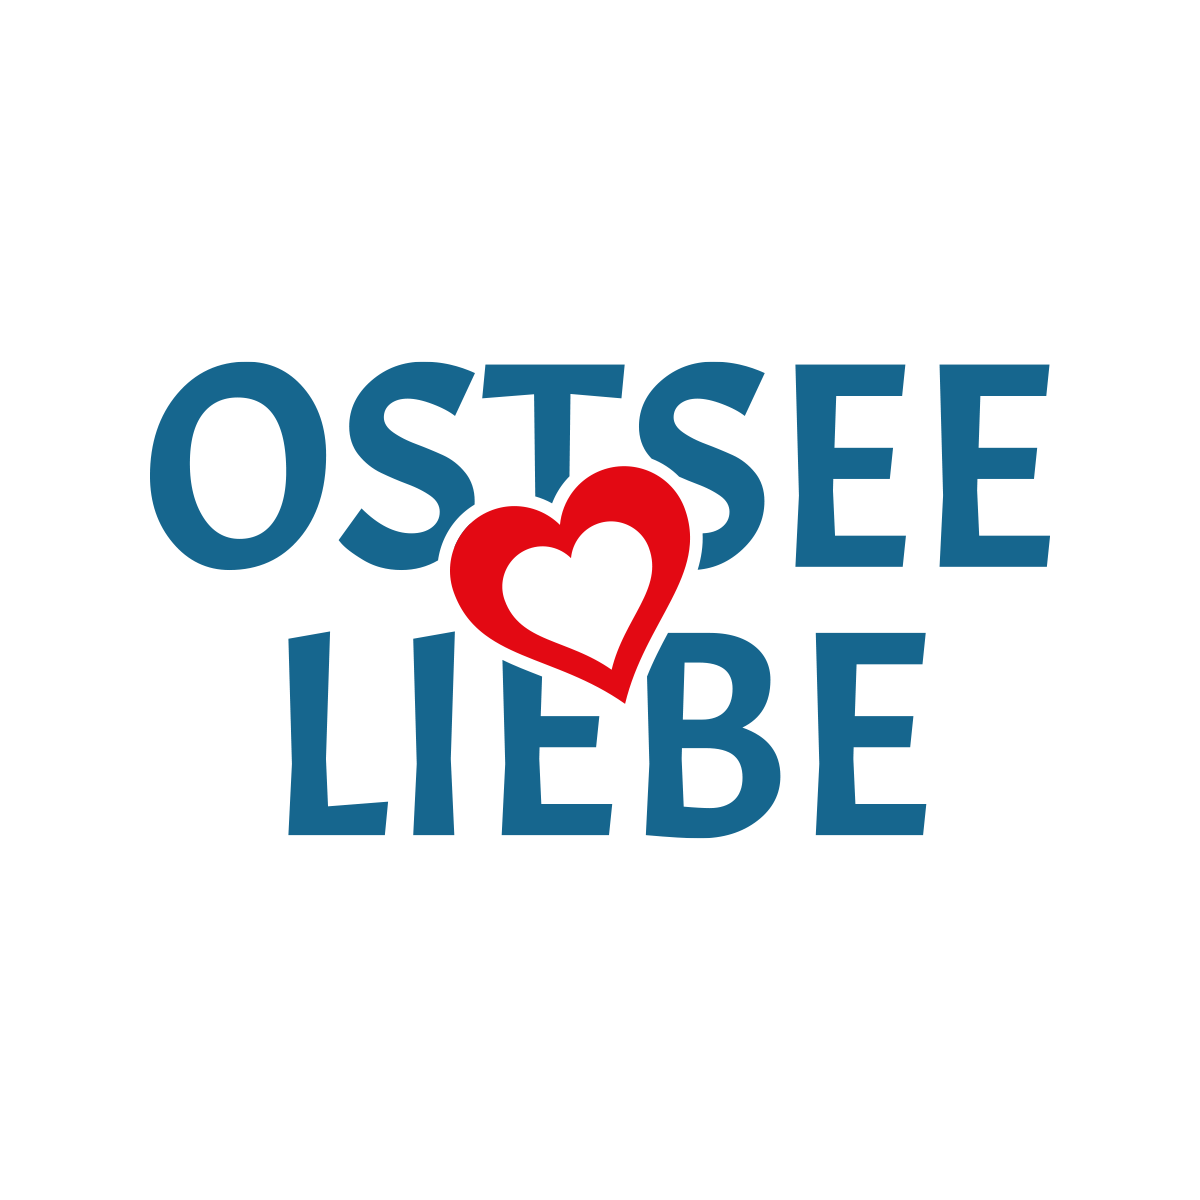 Ostseeliebe - TYP01A